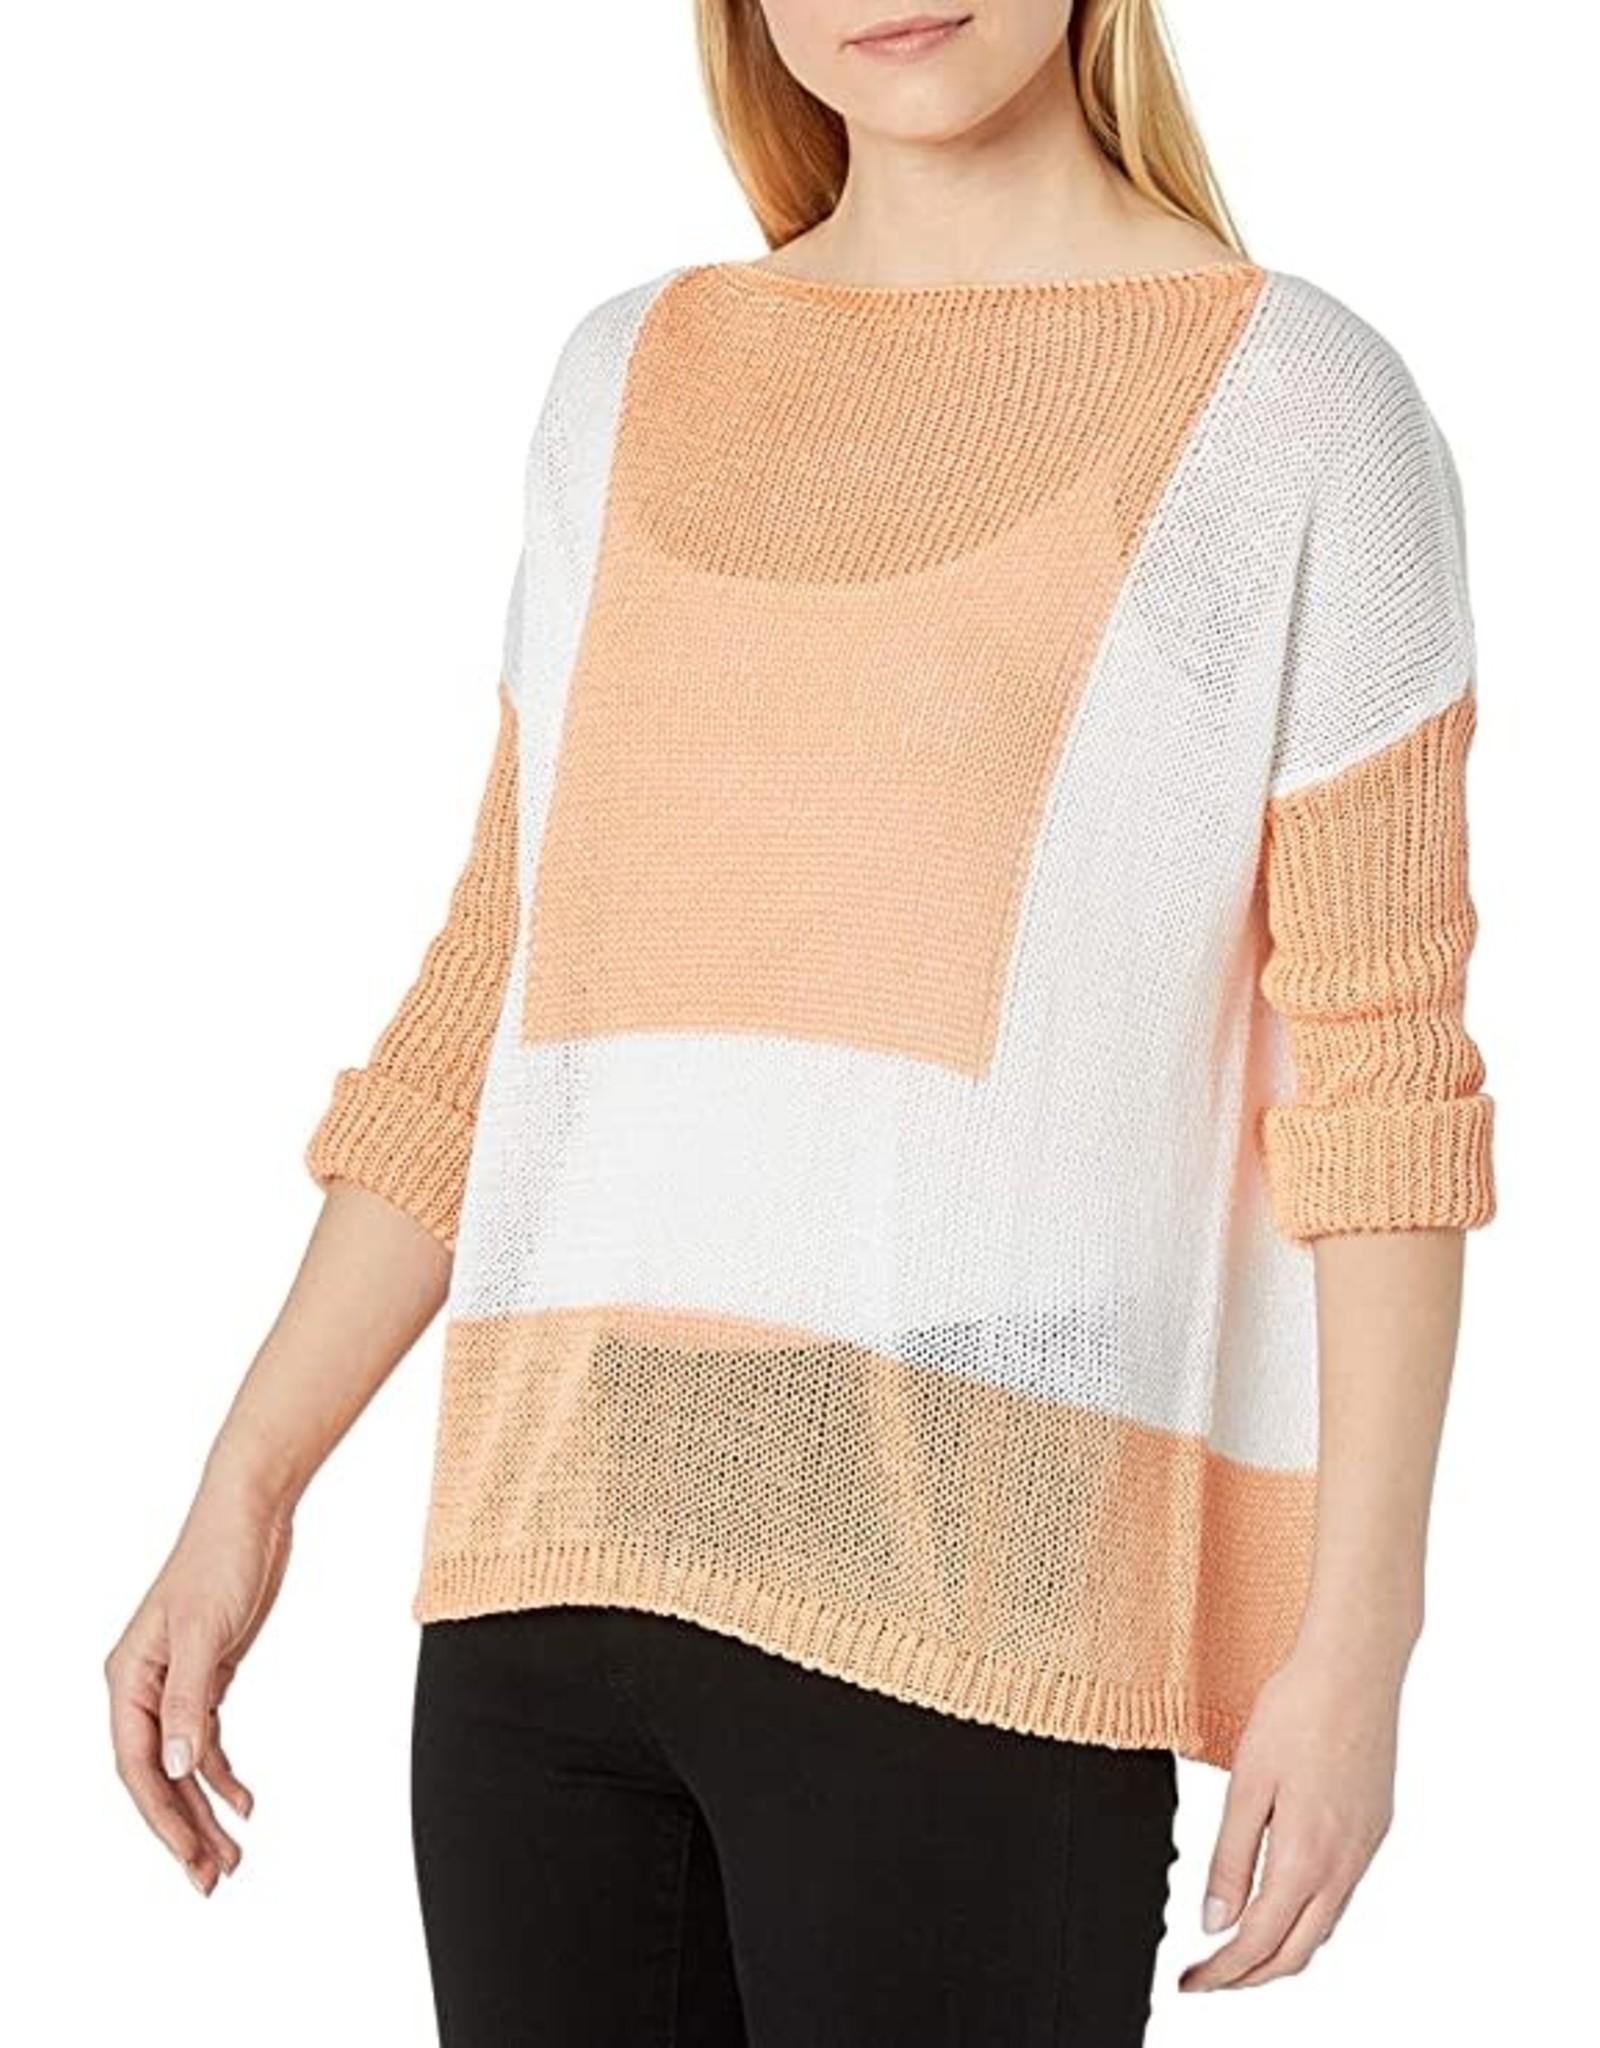 M Made In Italy White/Orange Crochet Sweater